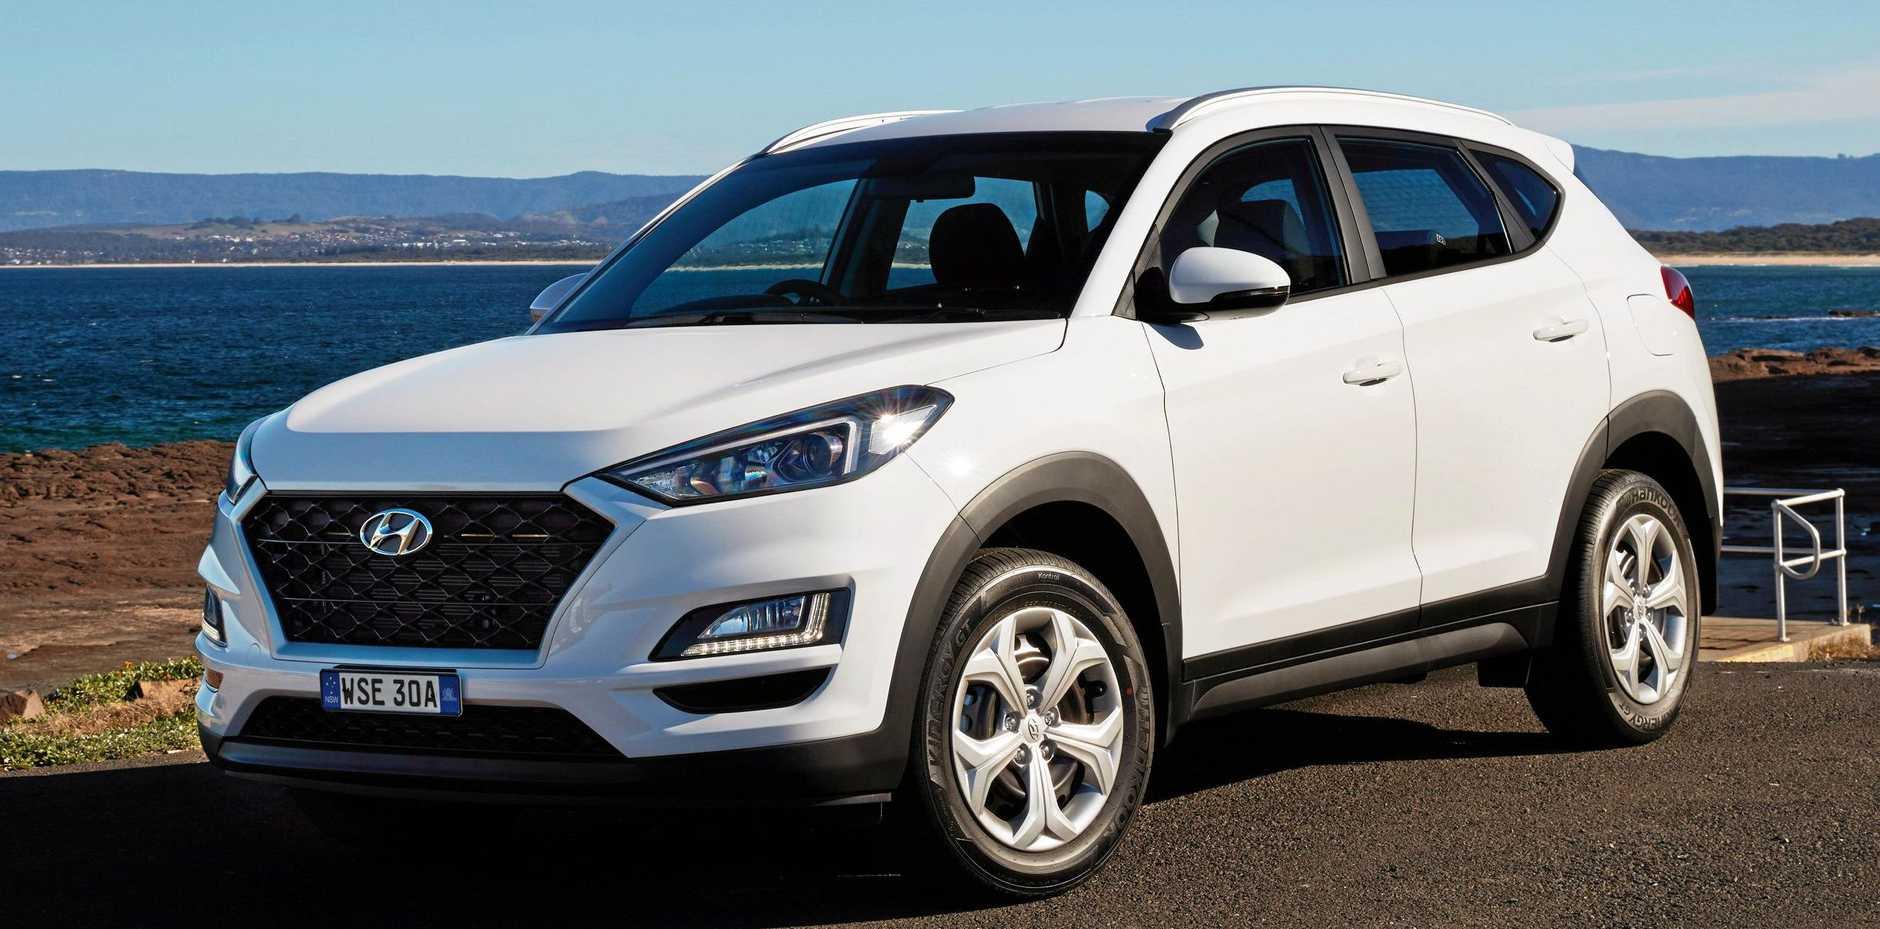 The 2018 model Hyundai Tucson Go.